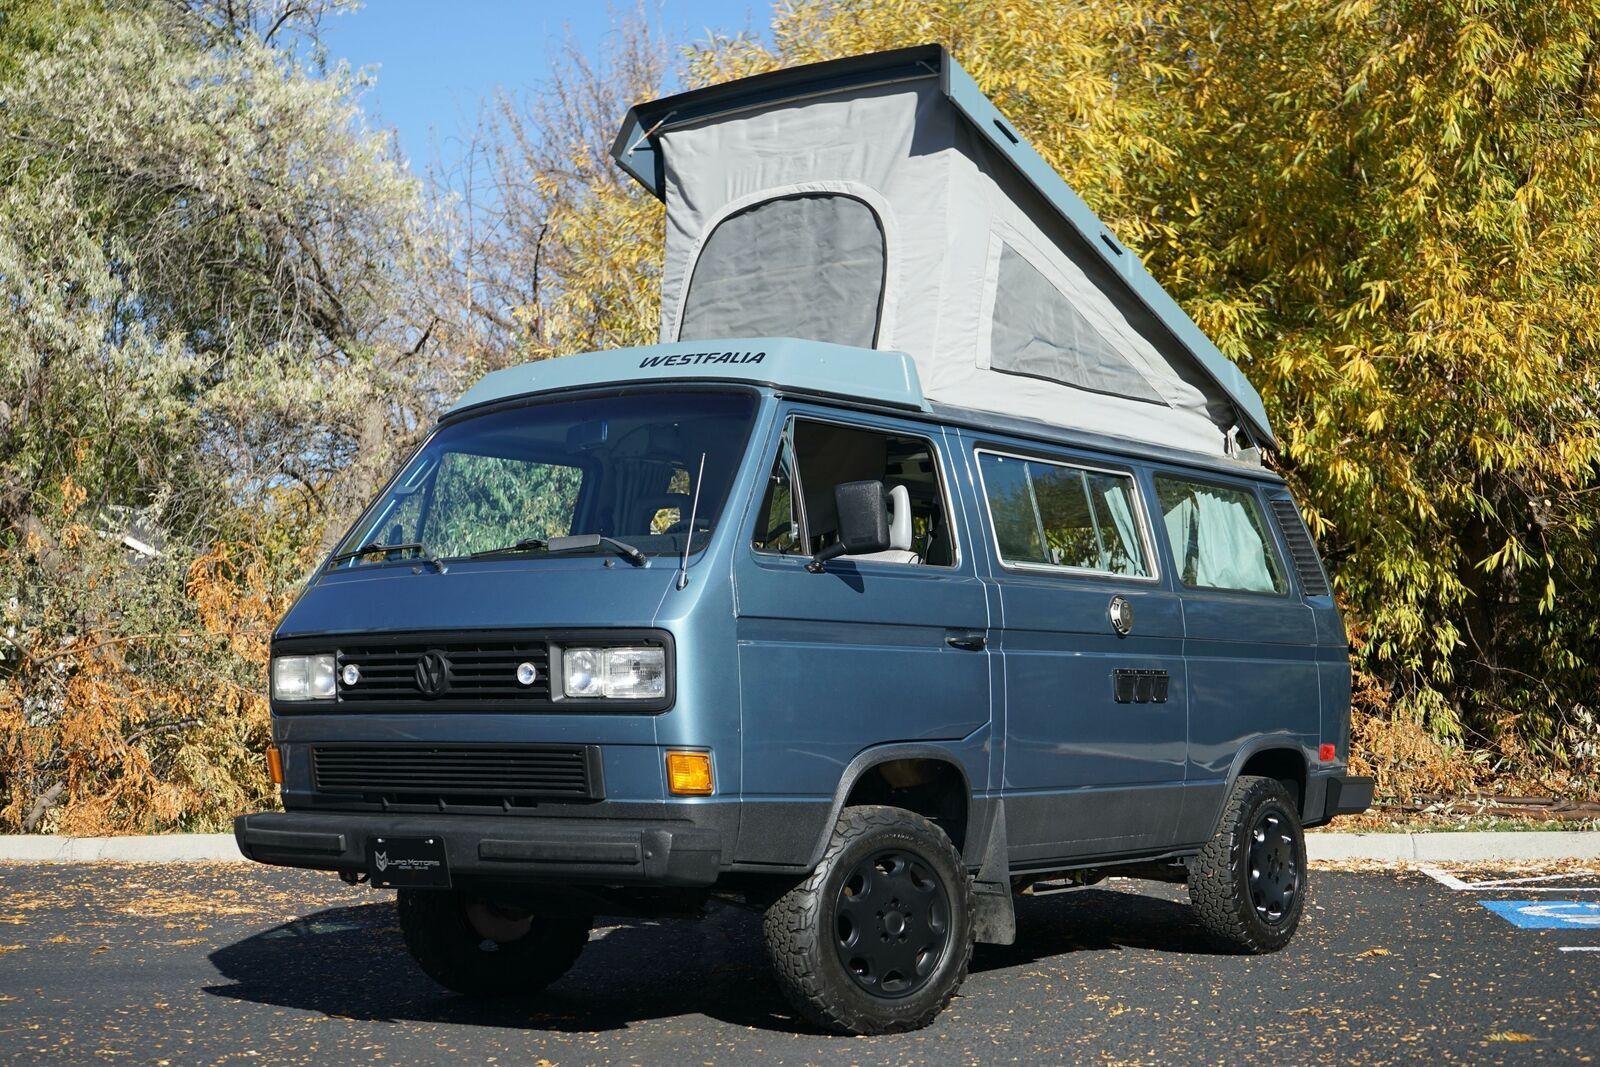 1987 vw vanagon westfalia camper 18turbo sah conversion WV2ZB0259HH014486 a